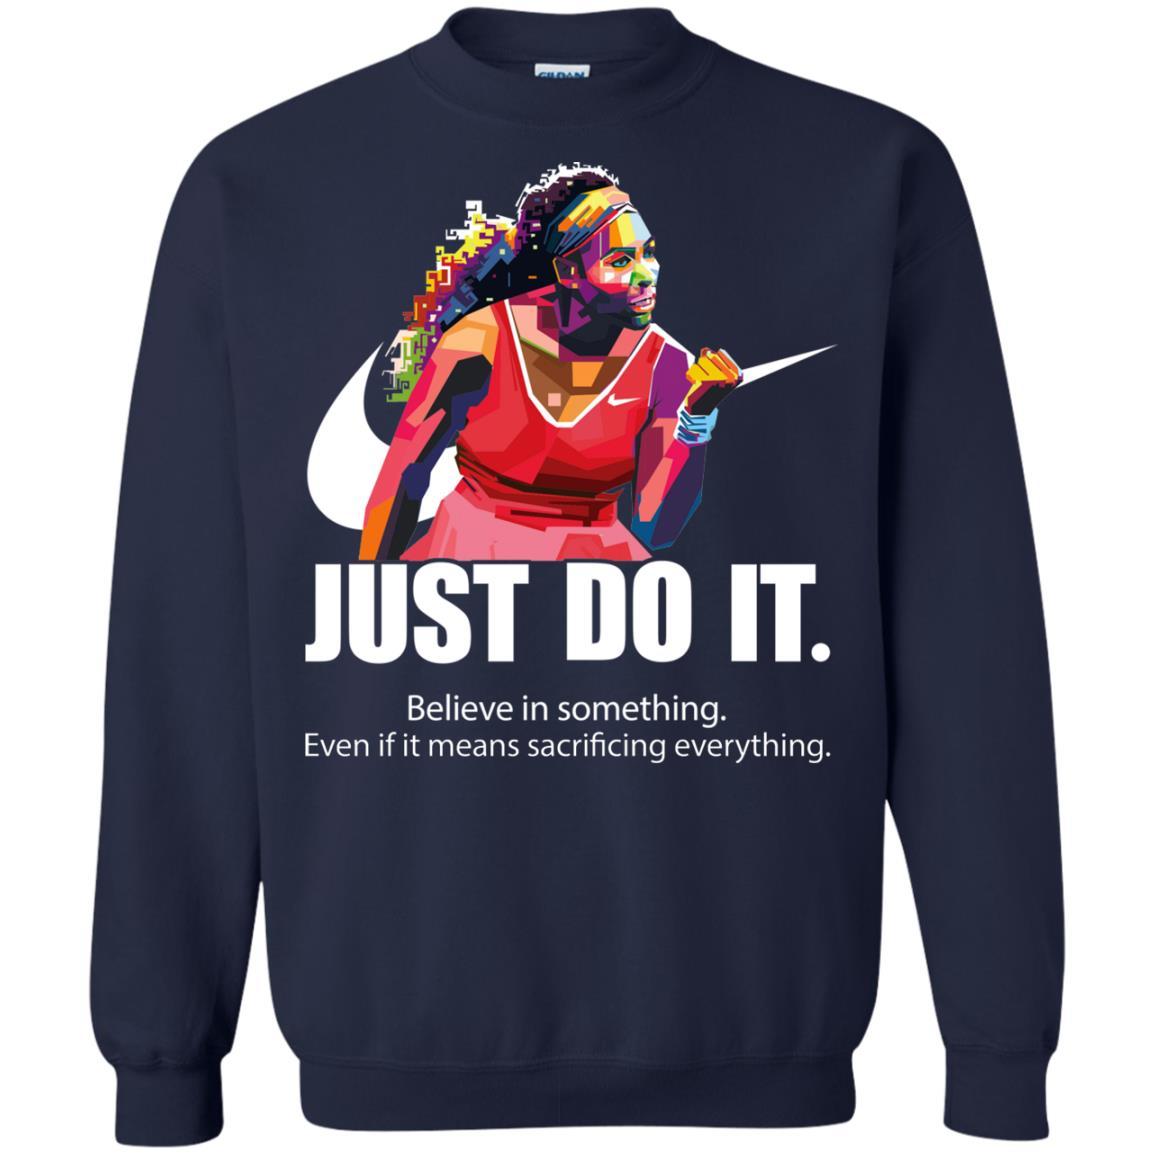 ff933b1bfac Serena Williams Just do it believe in something